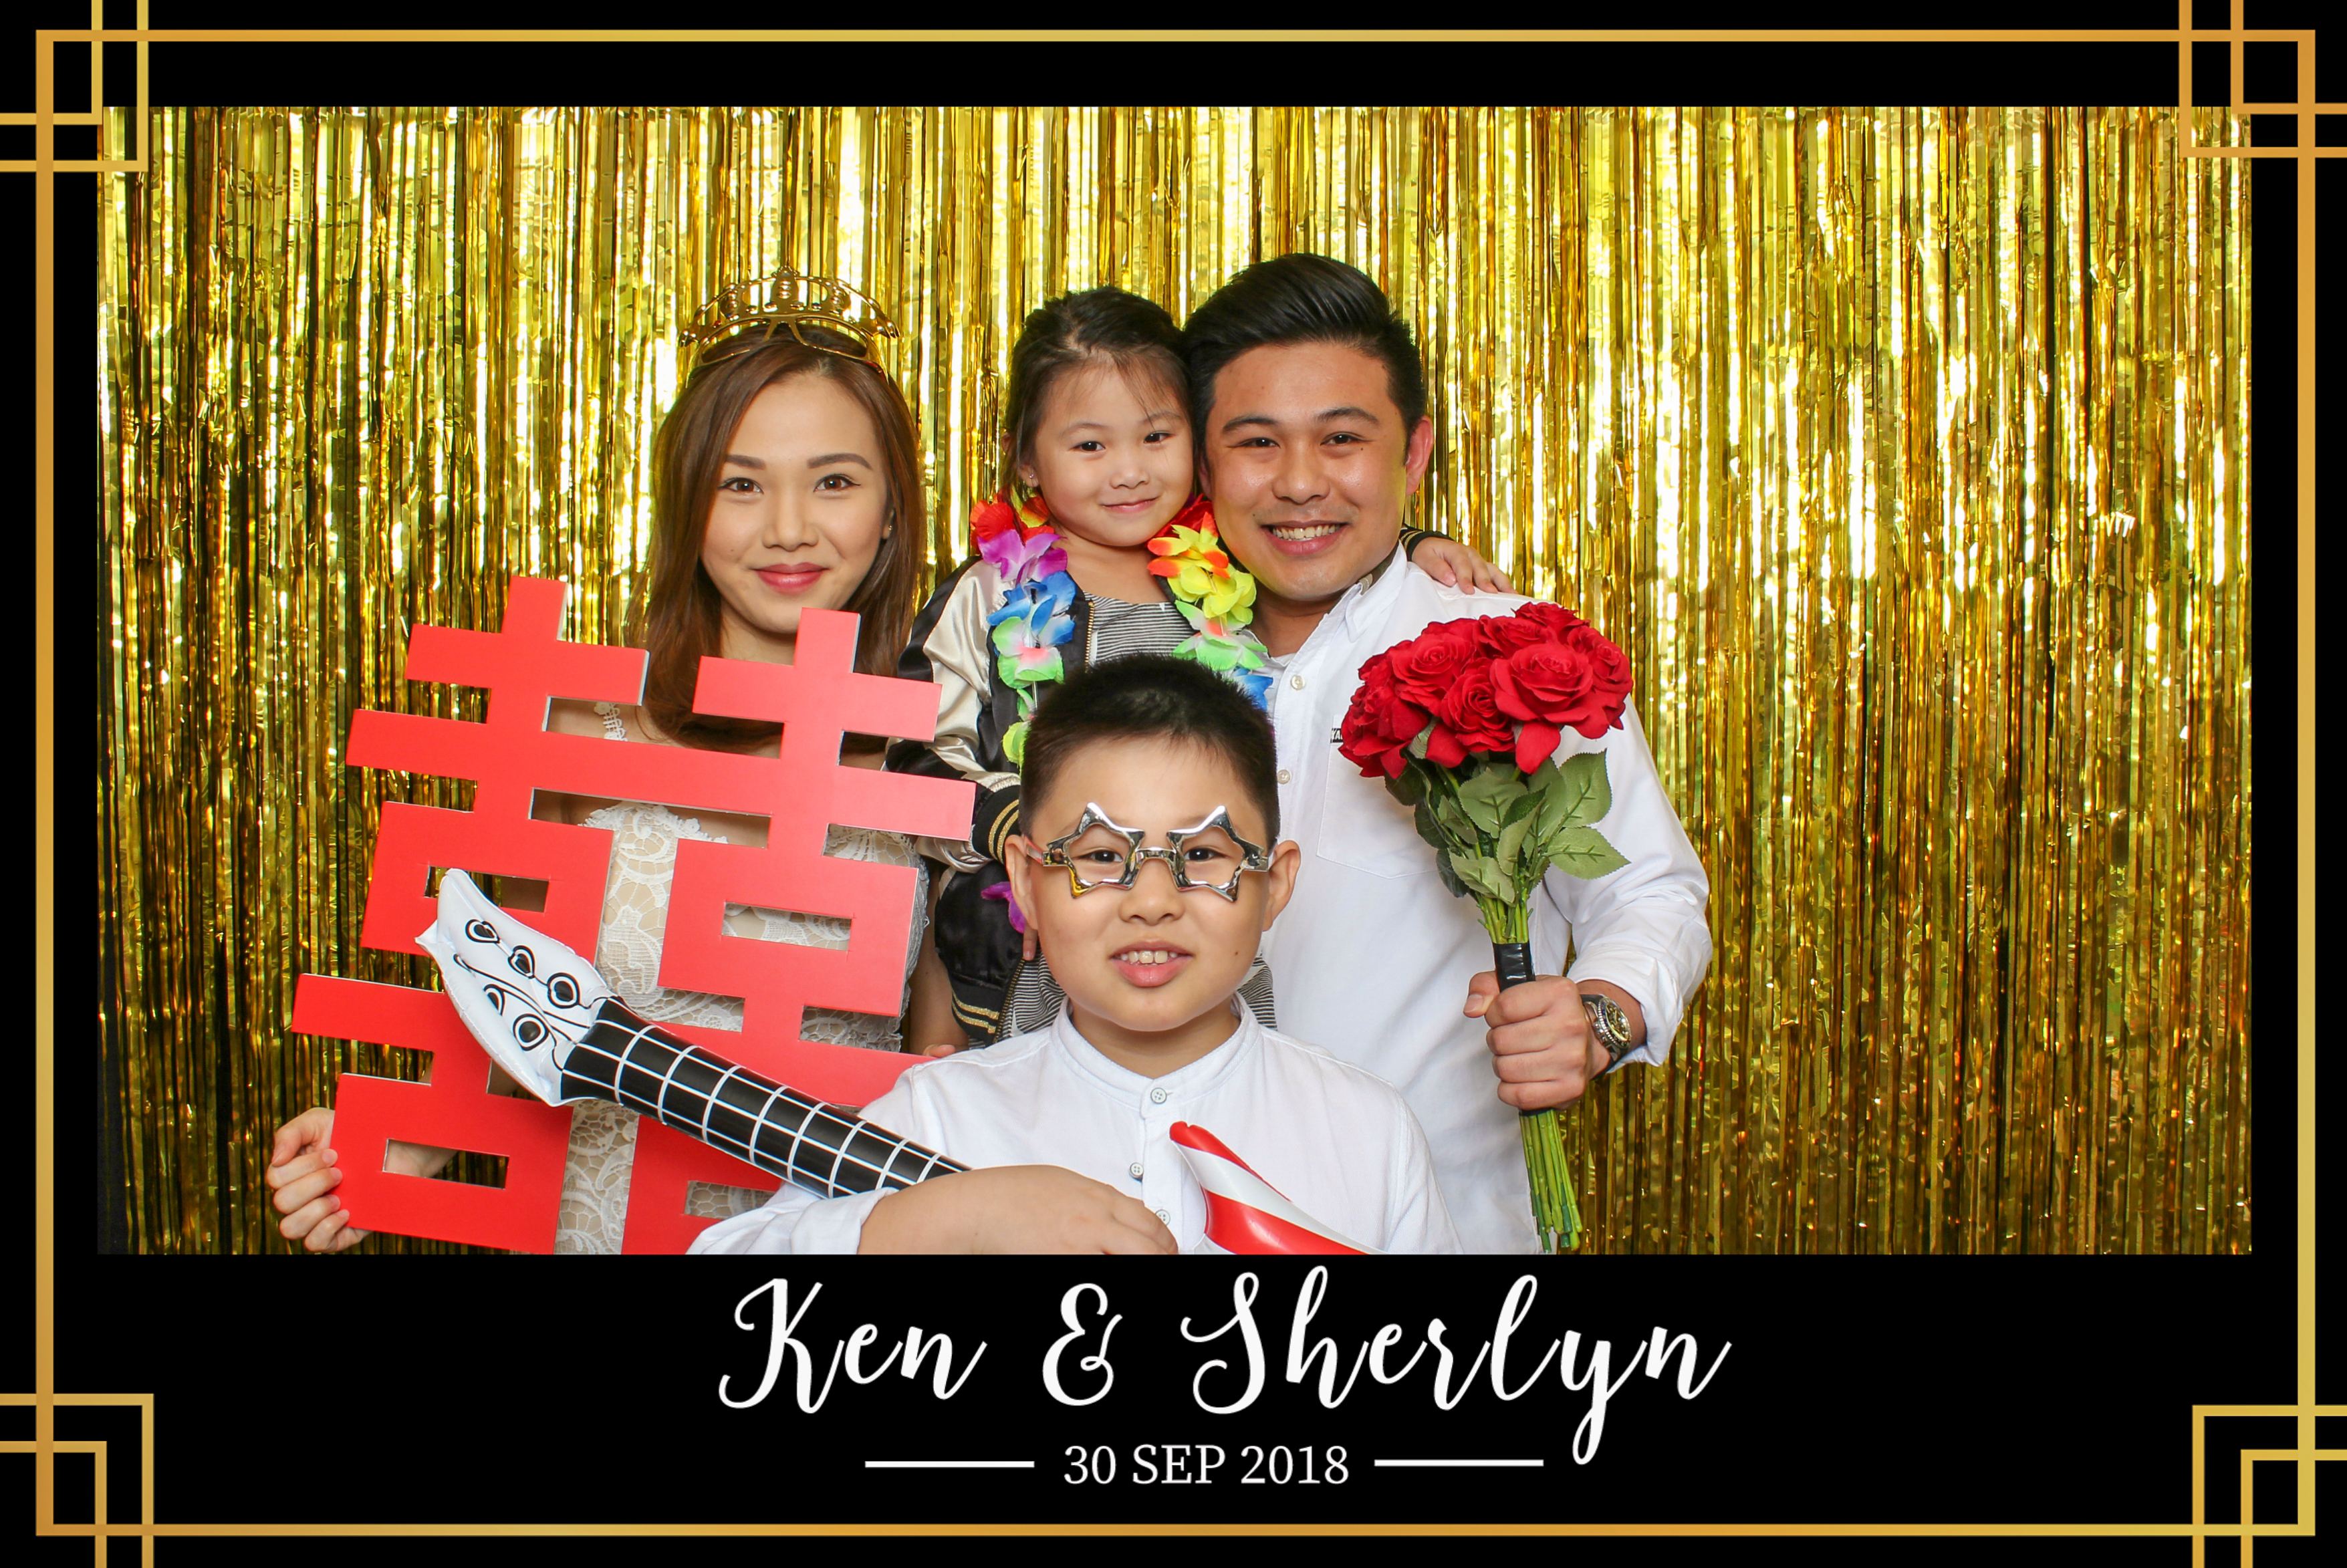 Ken Sherlyn wedding photo booth (37)